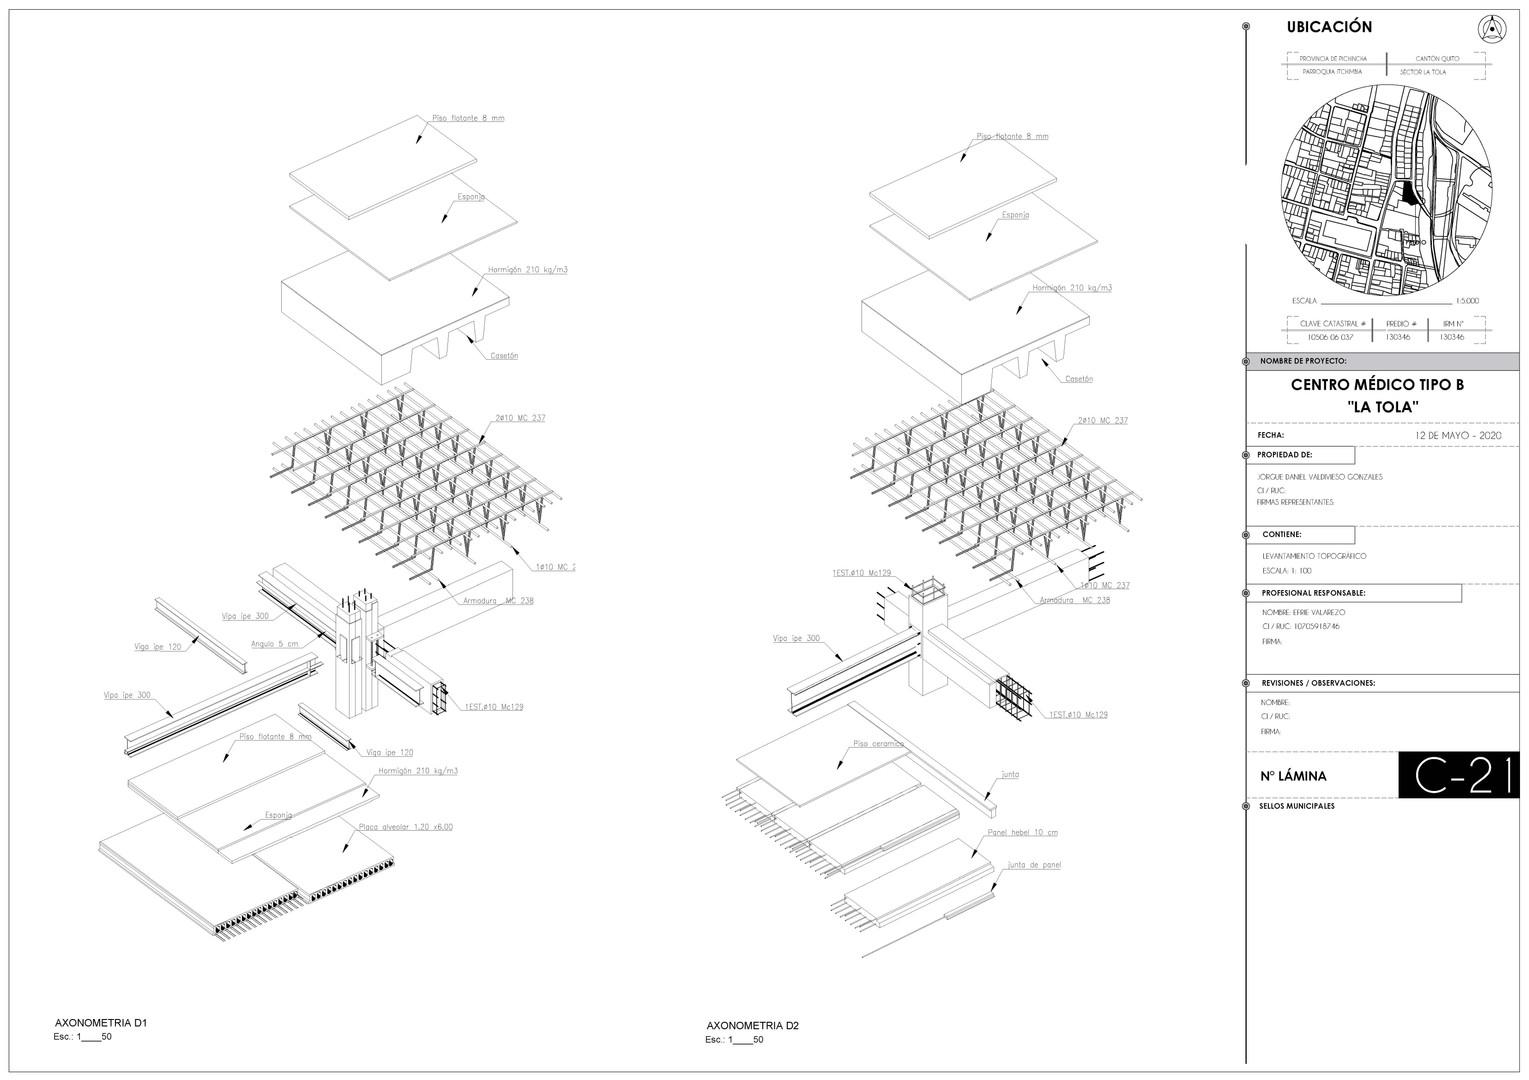 AxonometrÃ_a_Estructural.jpg